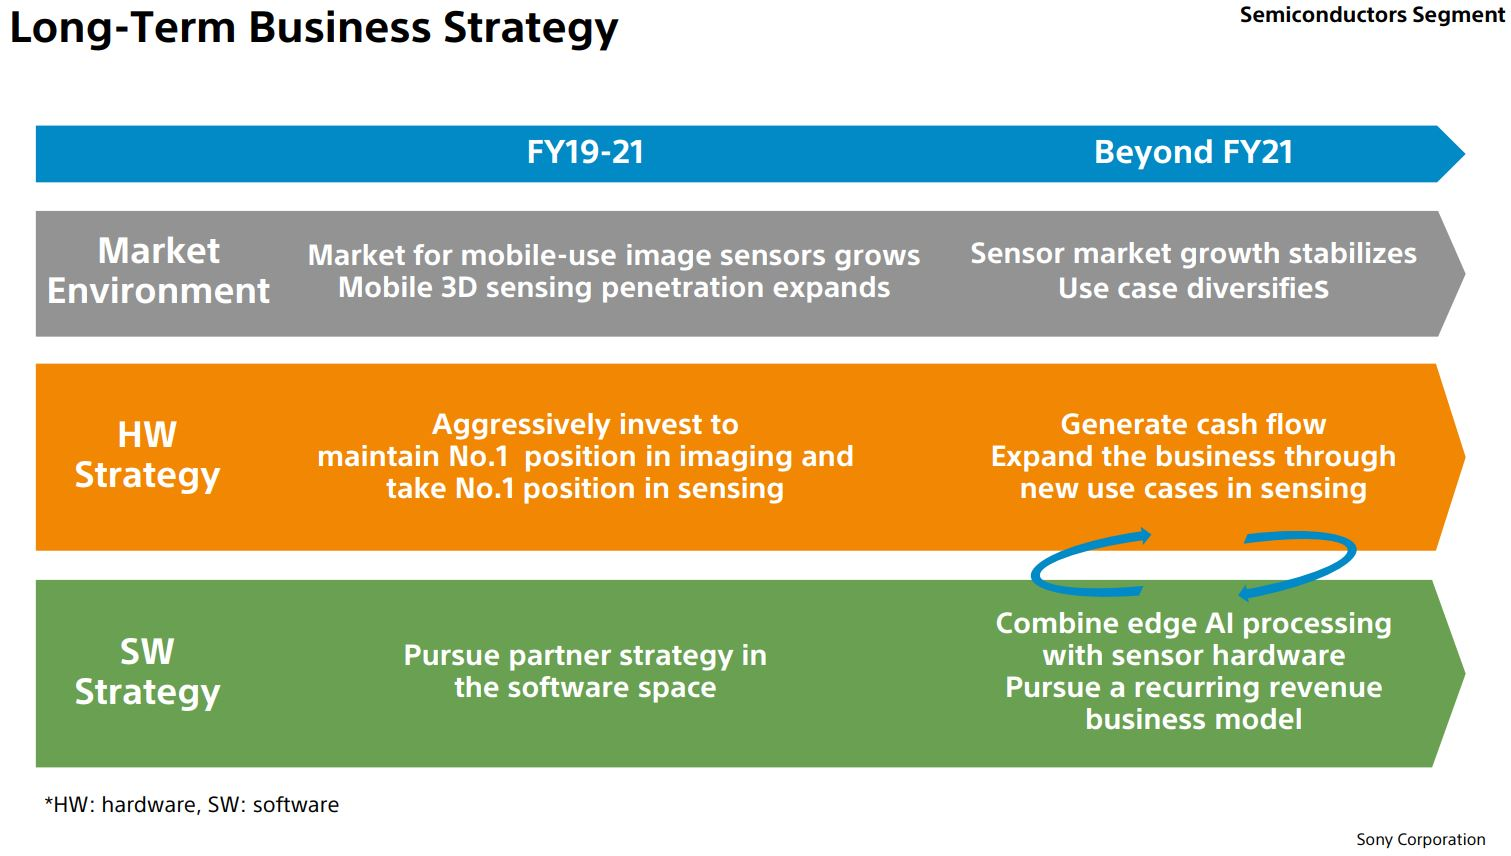 Image Sensors World: Sony Strategy